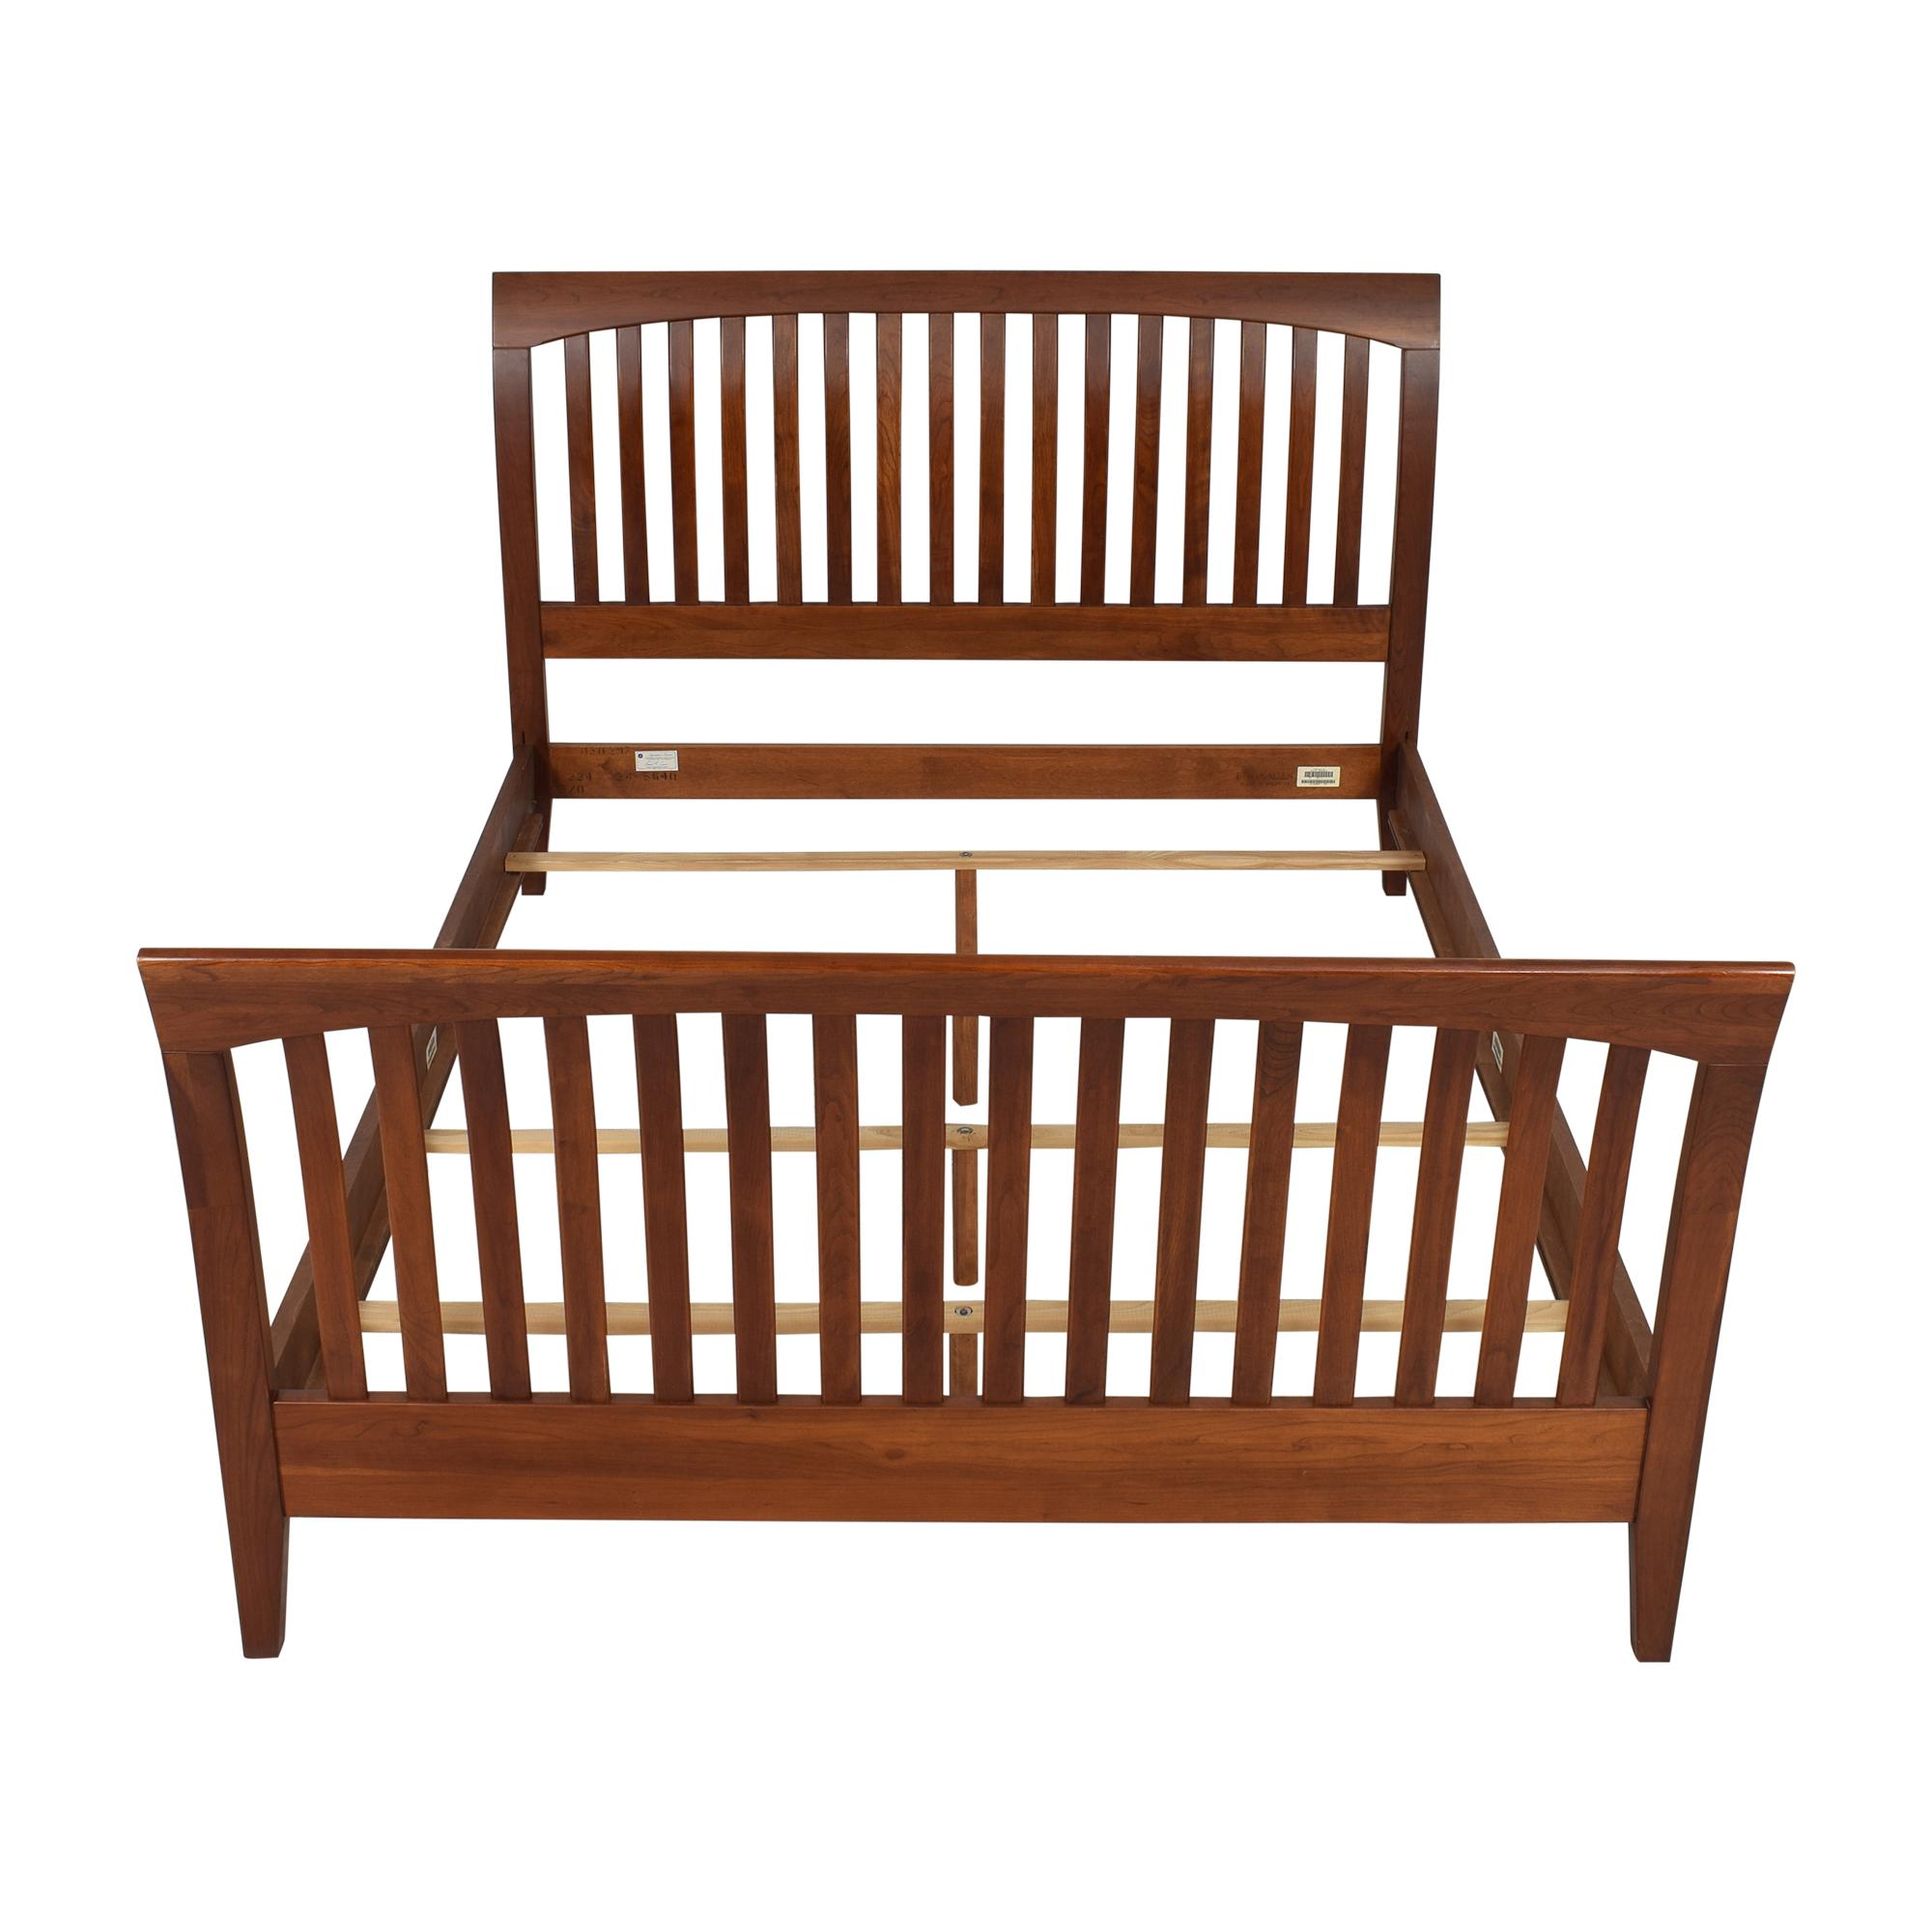 Ethan Allen Ethan Allen American Impressions Queen Sleigh Bed Frame ct